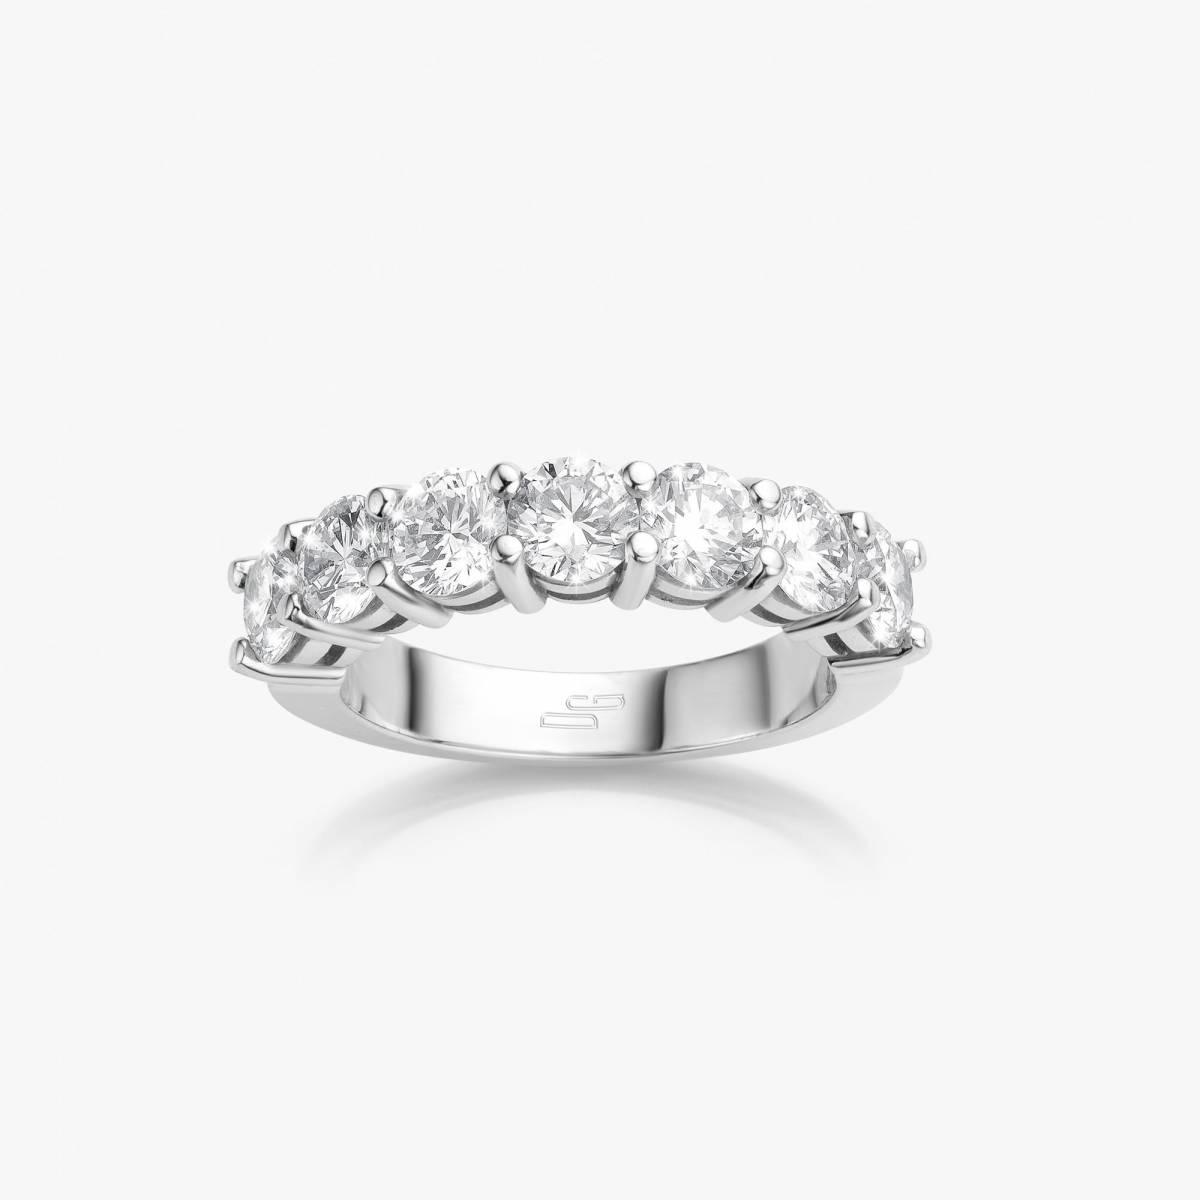 Maison De Greef - Juwelen - Brussel - Bruidsjuwelen - Trouwring - Verlovingsring - House of Weddings - 12